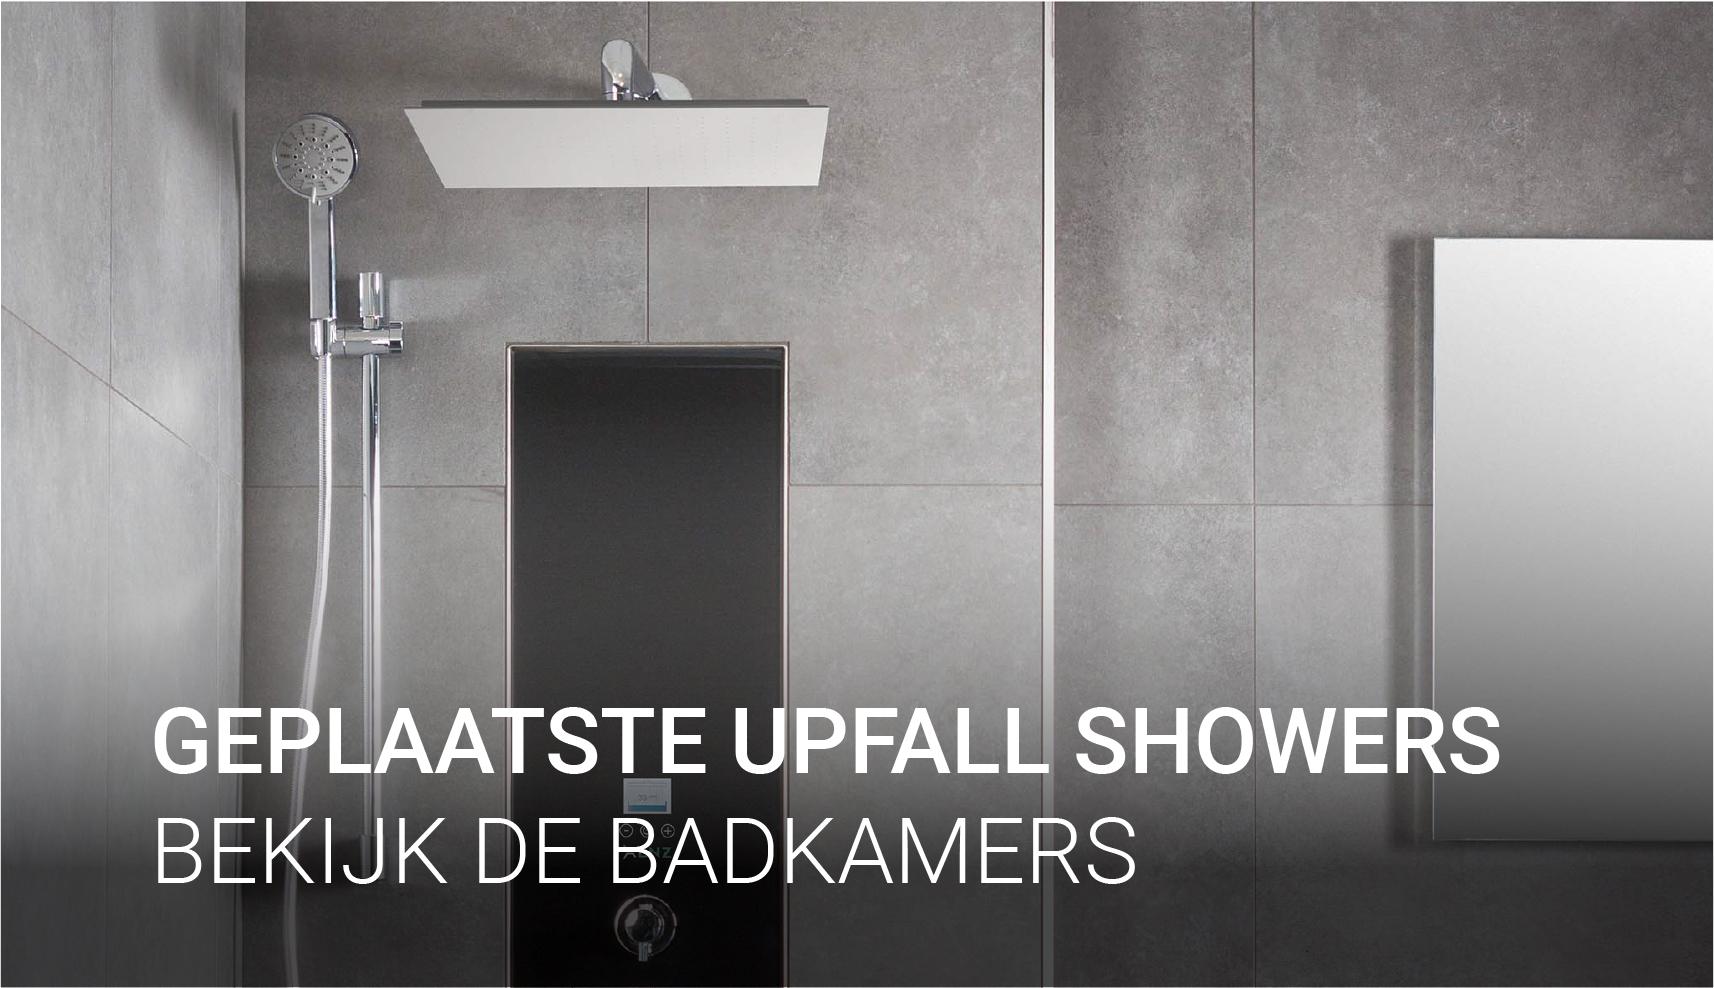 Geplaatste Upfall Showers